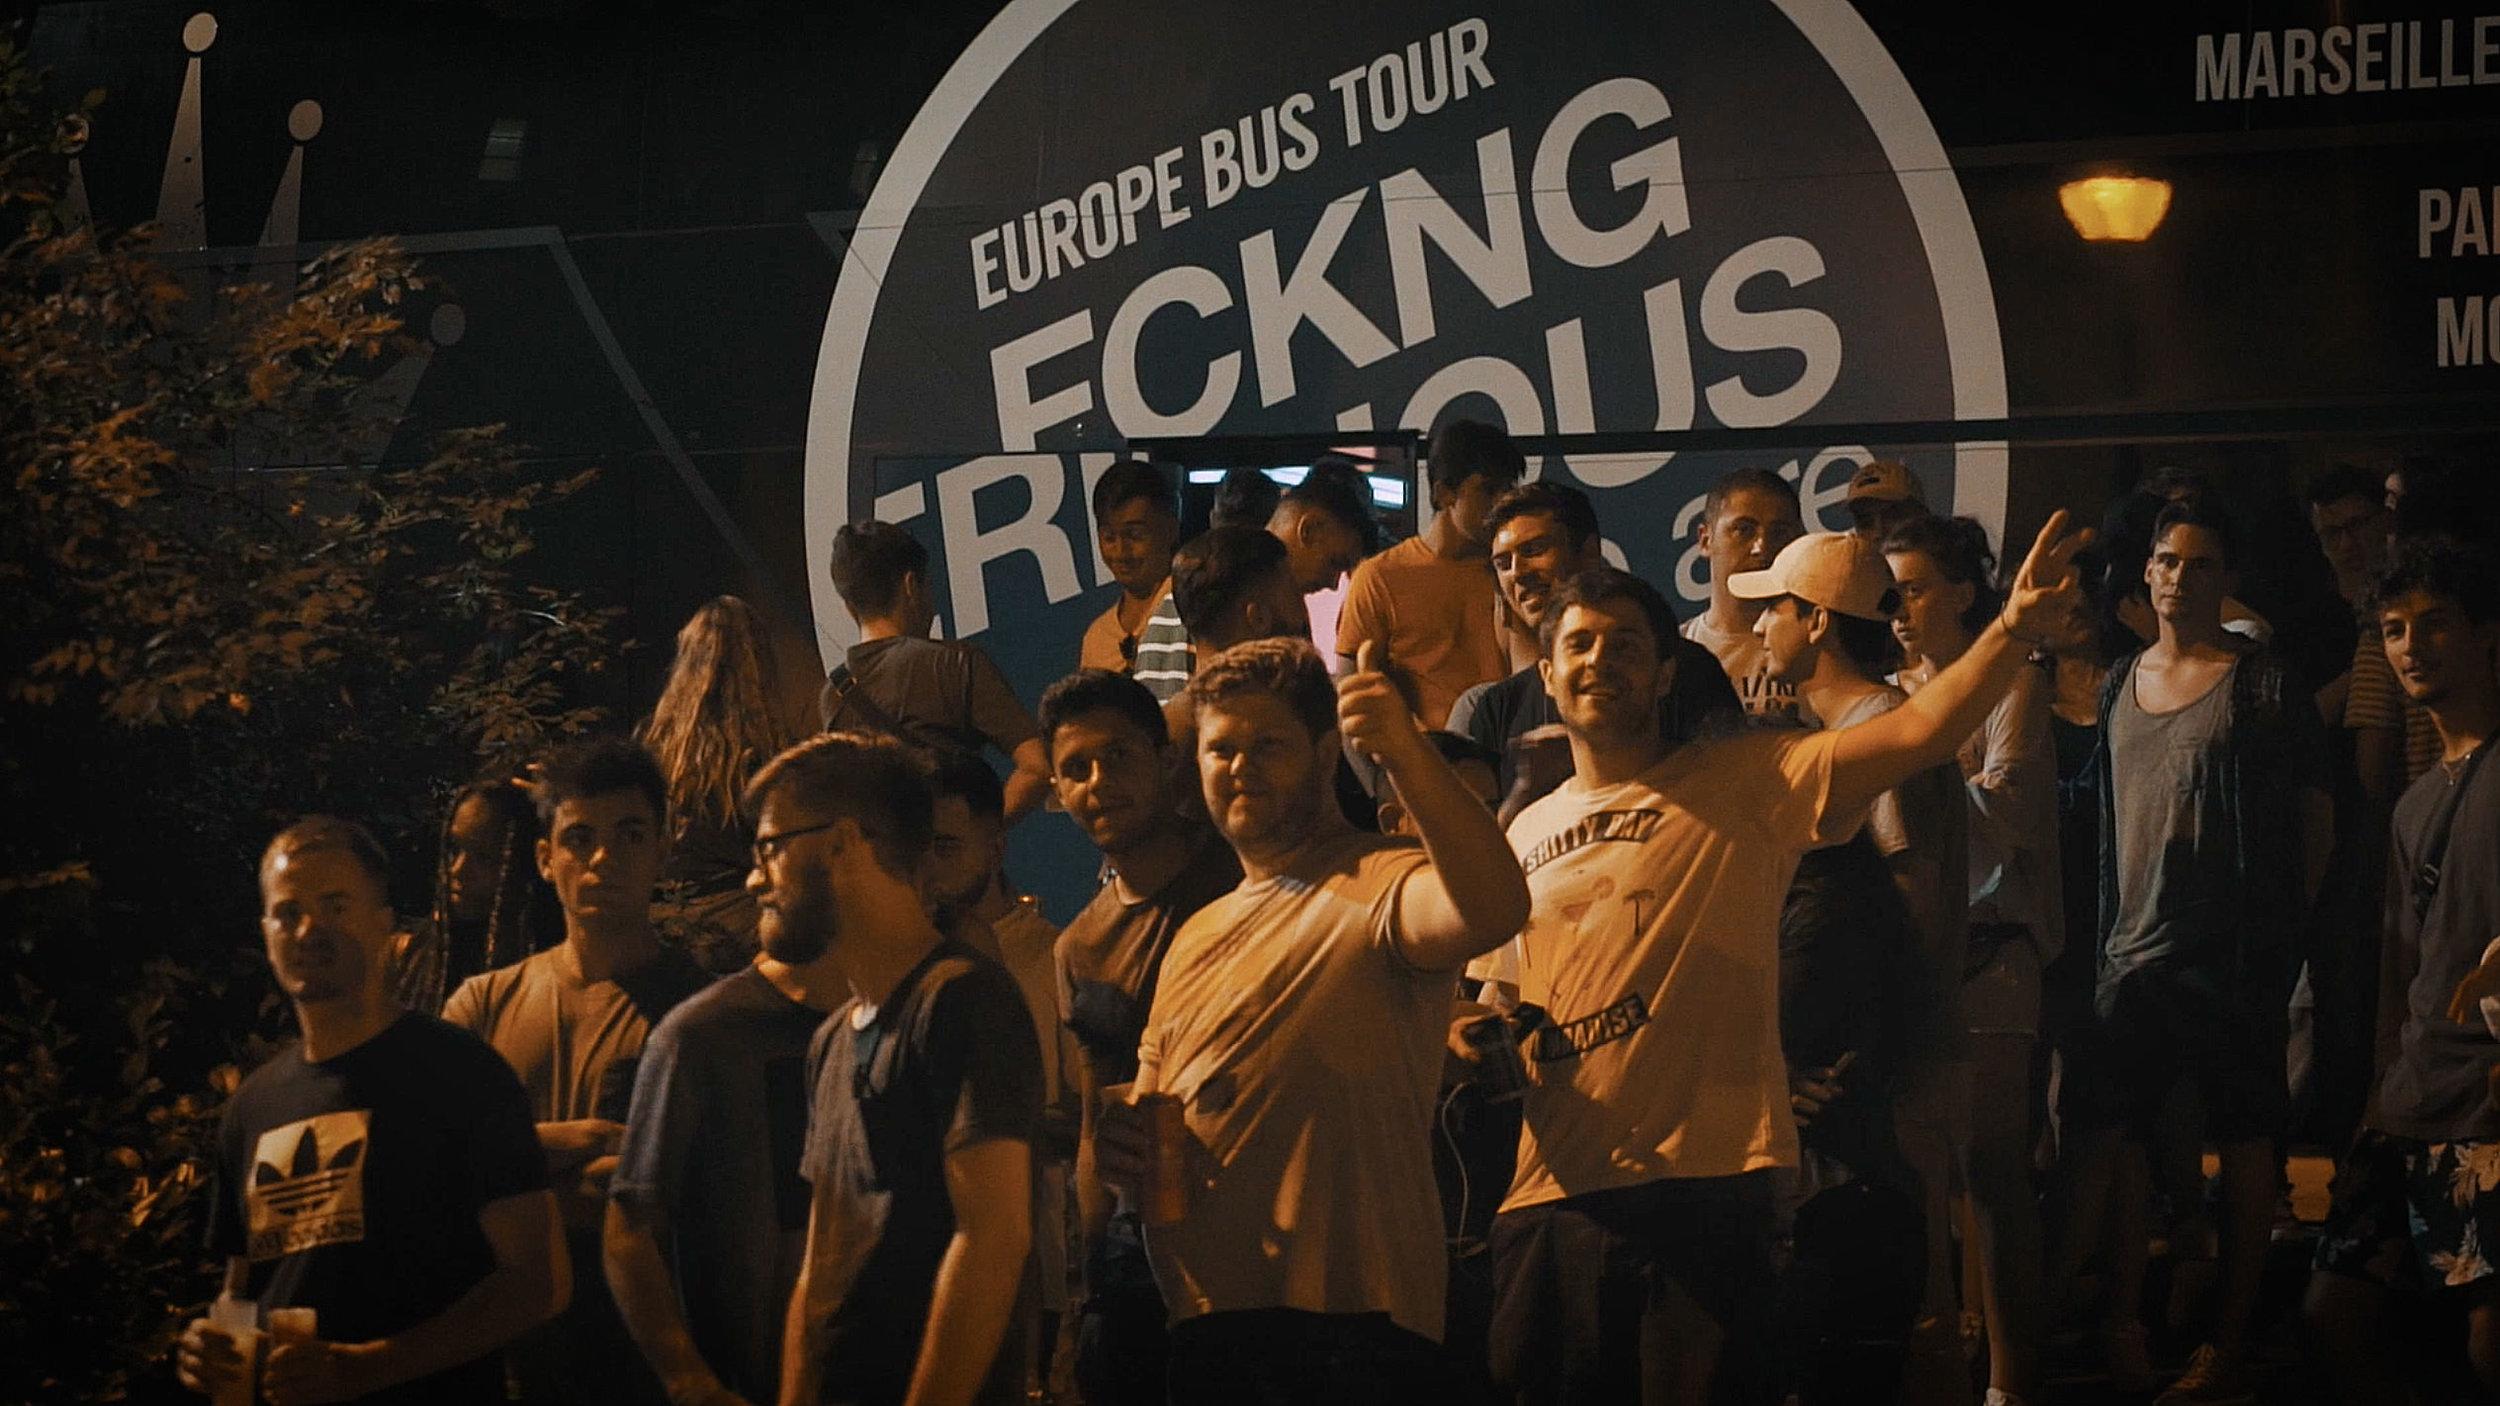 Input - 21.09.2018 Barcelona (Spain)FCKNG SERIOUS EUROPE BUS TOUR